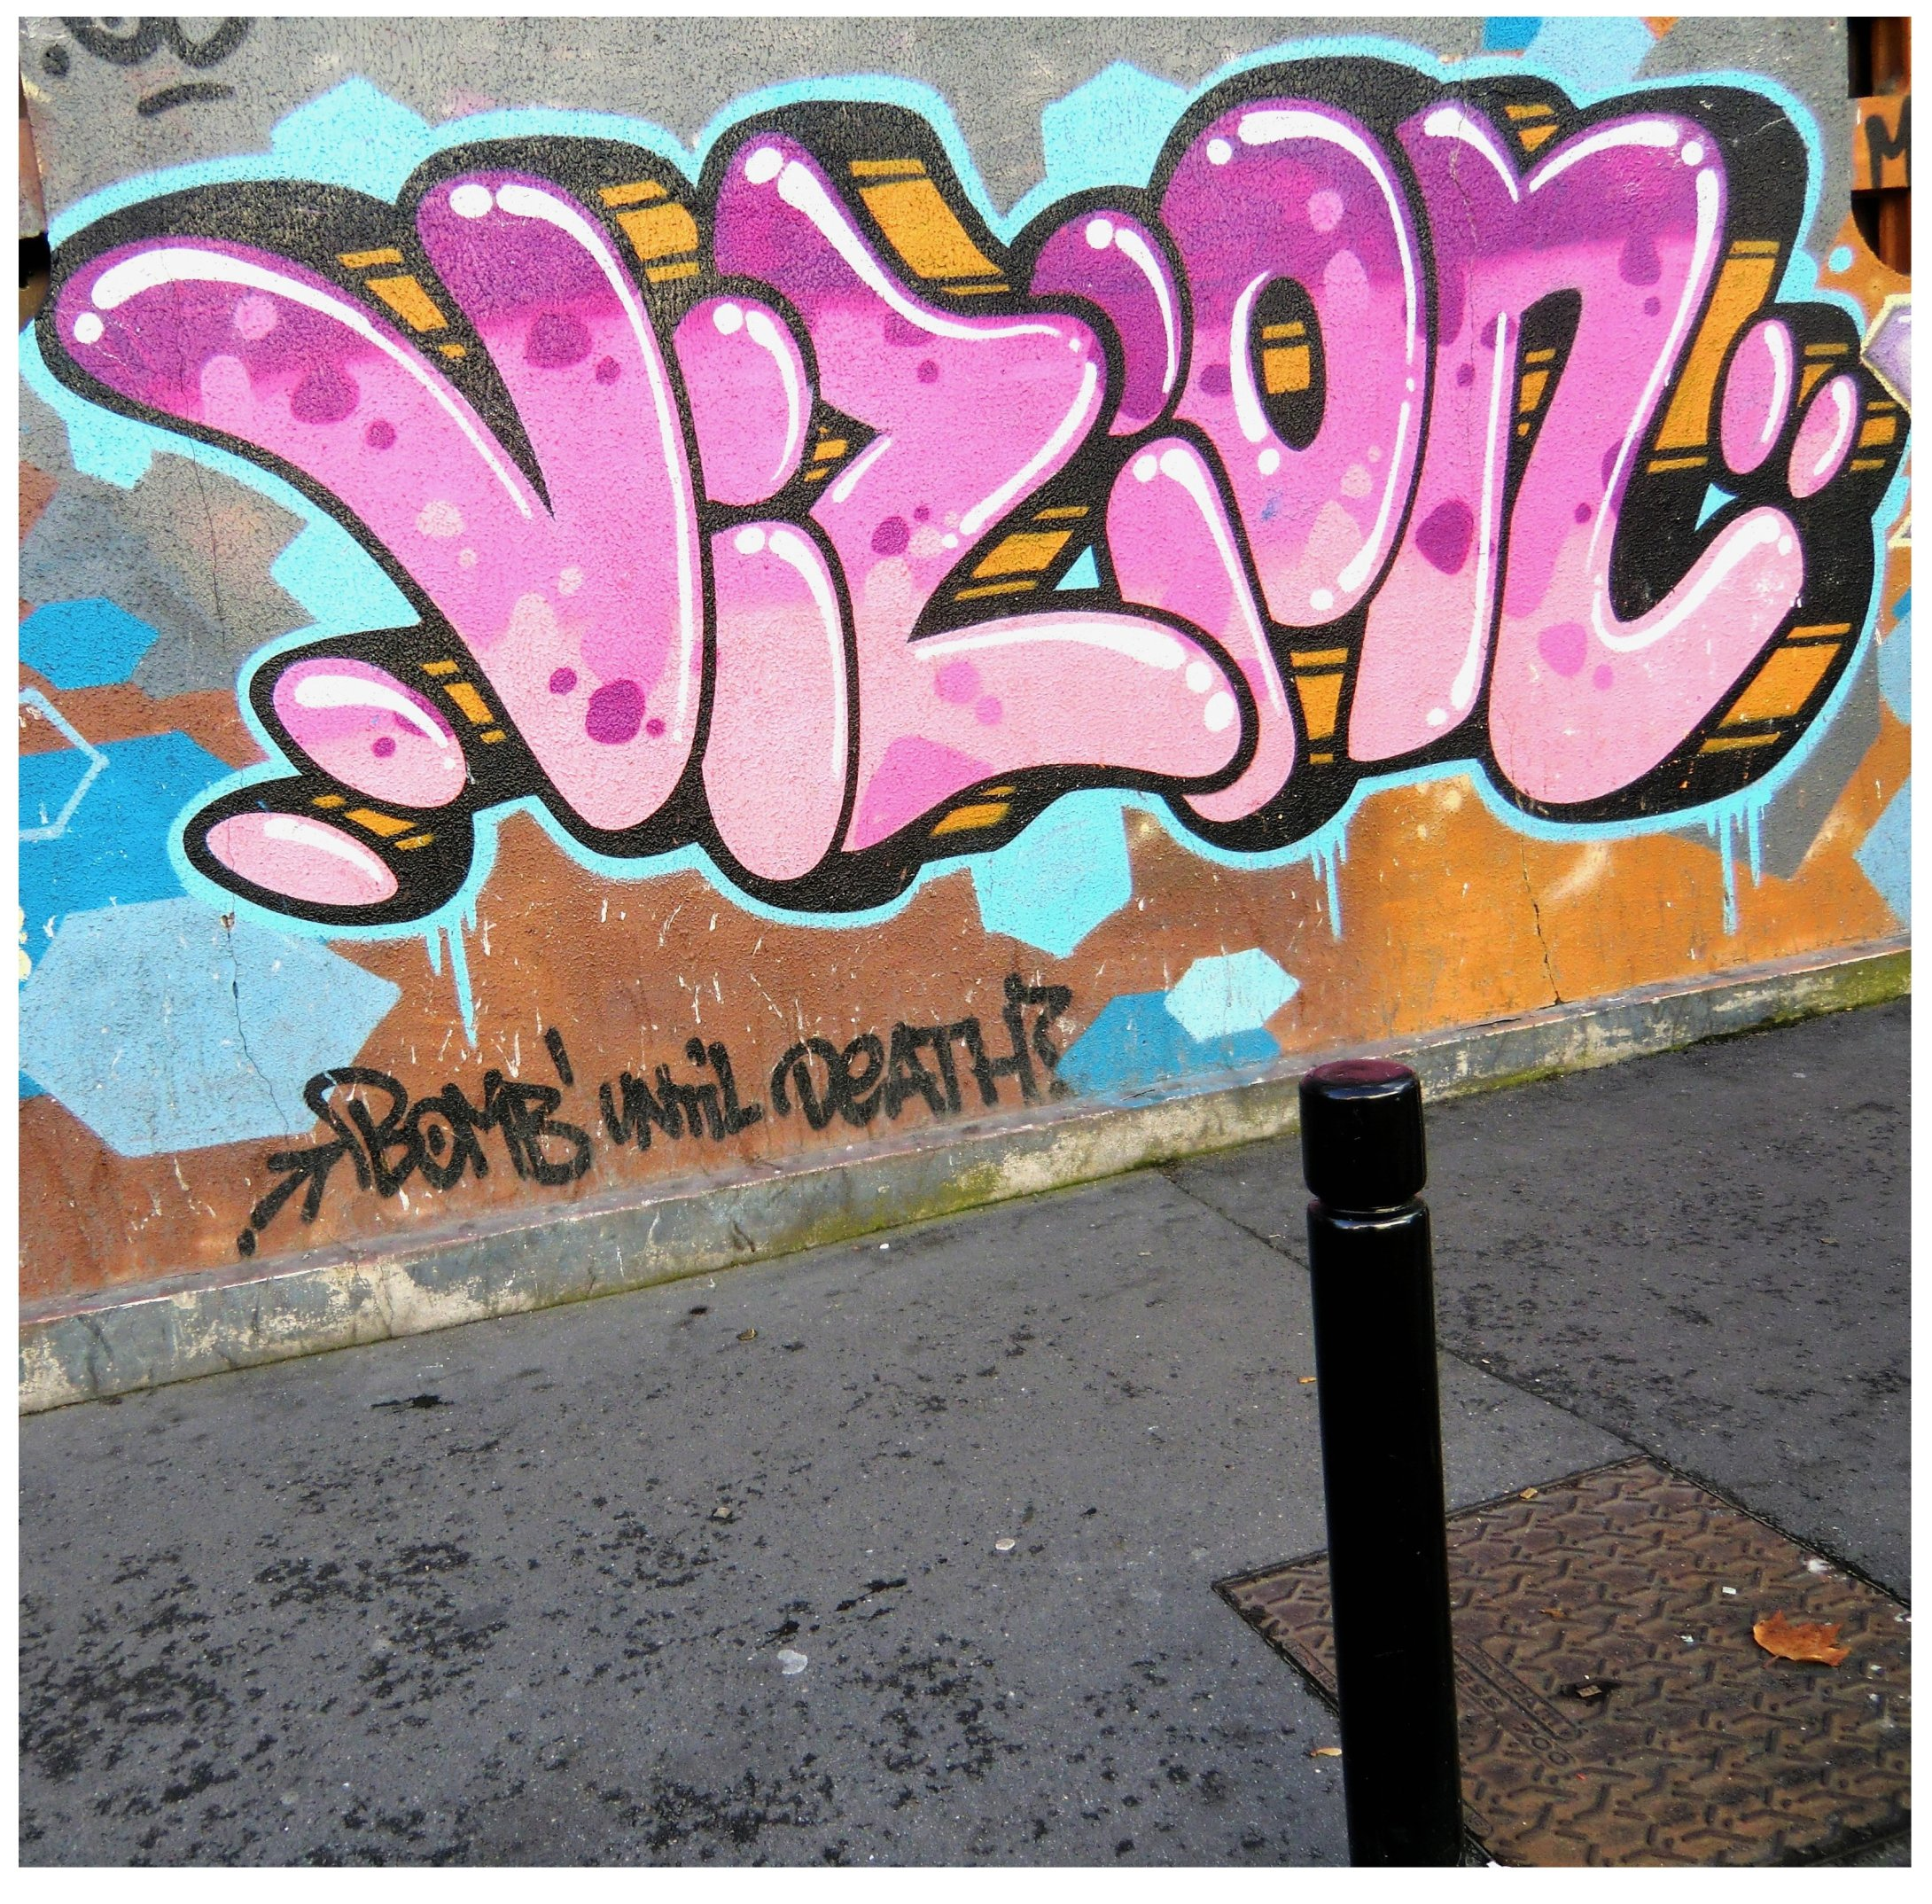 afarm5.static.flickr.com_4044_5148557283_6670b2bc47_o.jpg